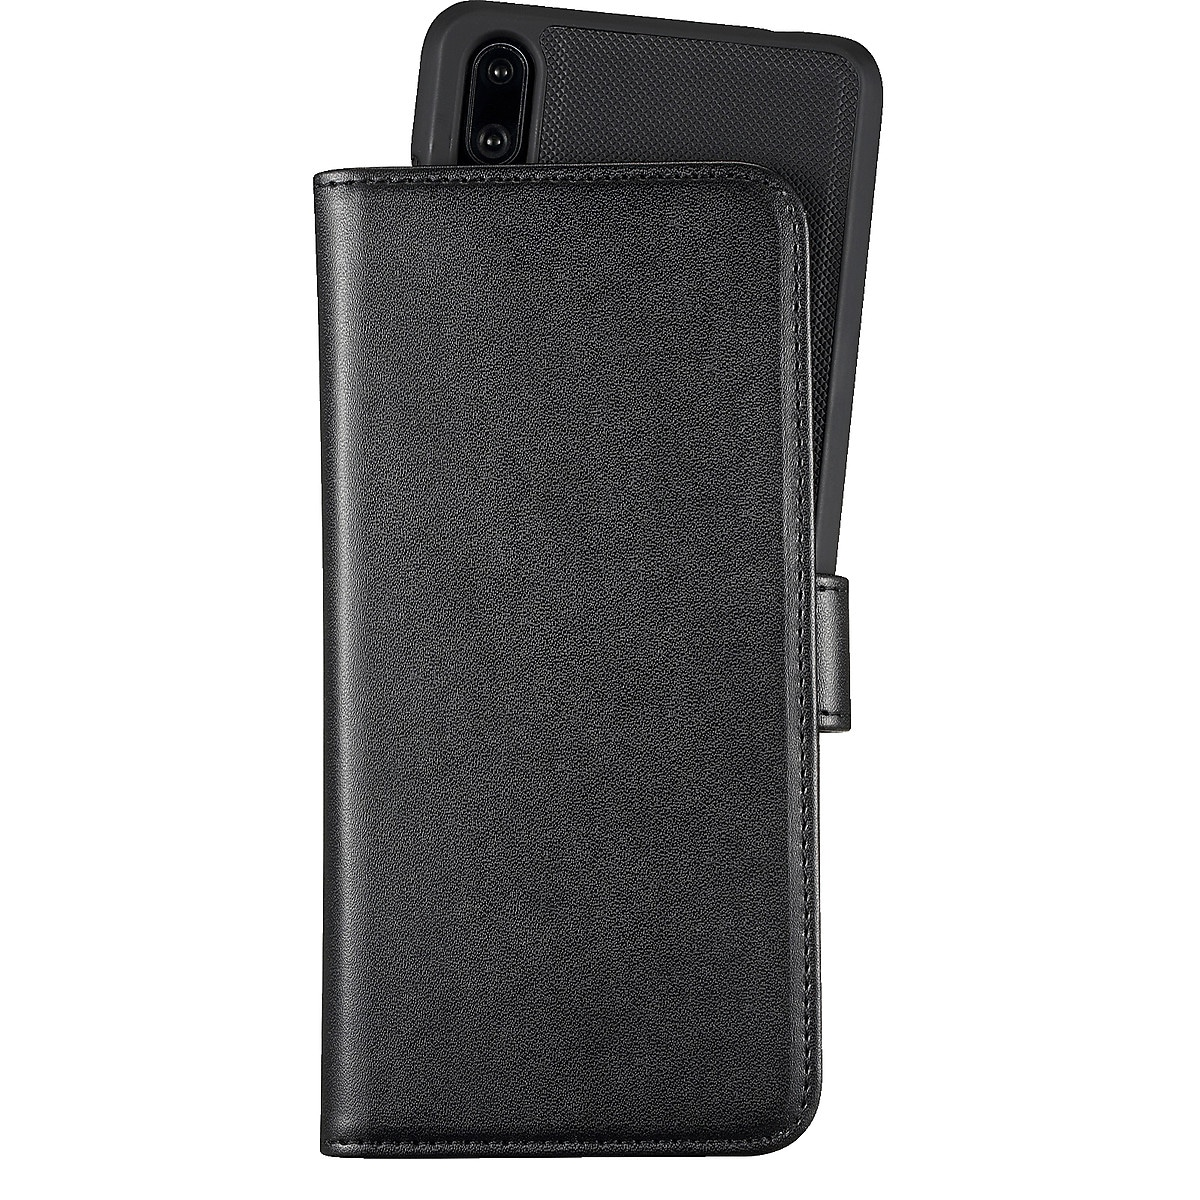 Plånboksfodral för Huawei P20 Pro Holdit